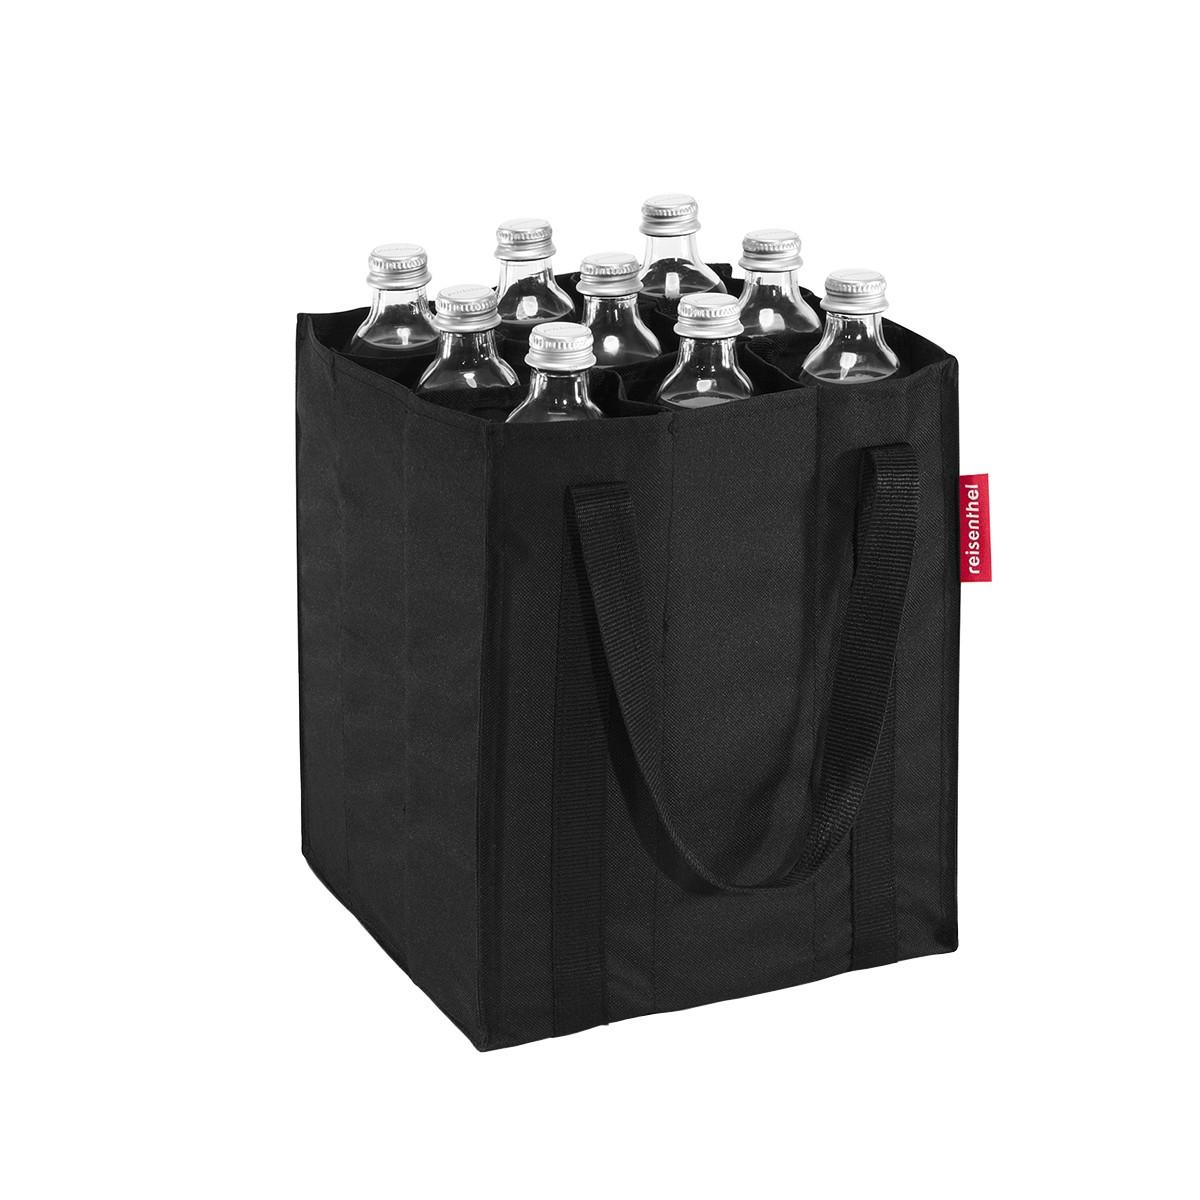 sac bouteilles en tissu noir cuisine rangement boissons. Black Bedroom Furniture Sets. Home Design Ideas